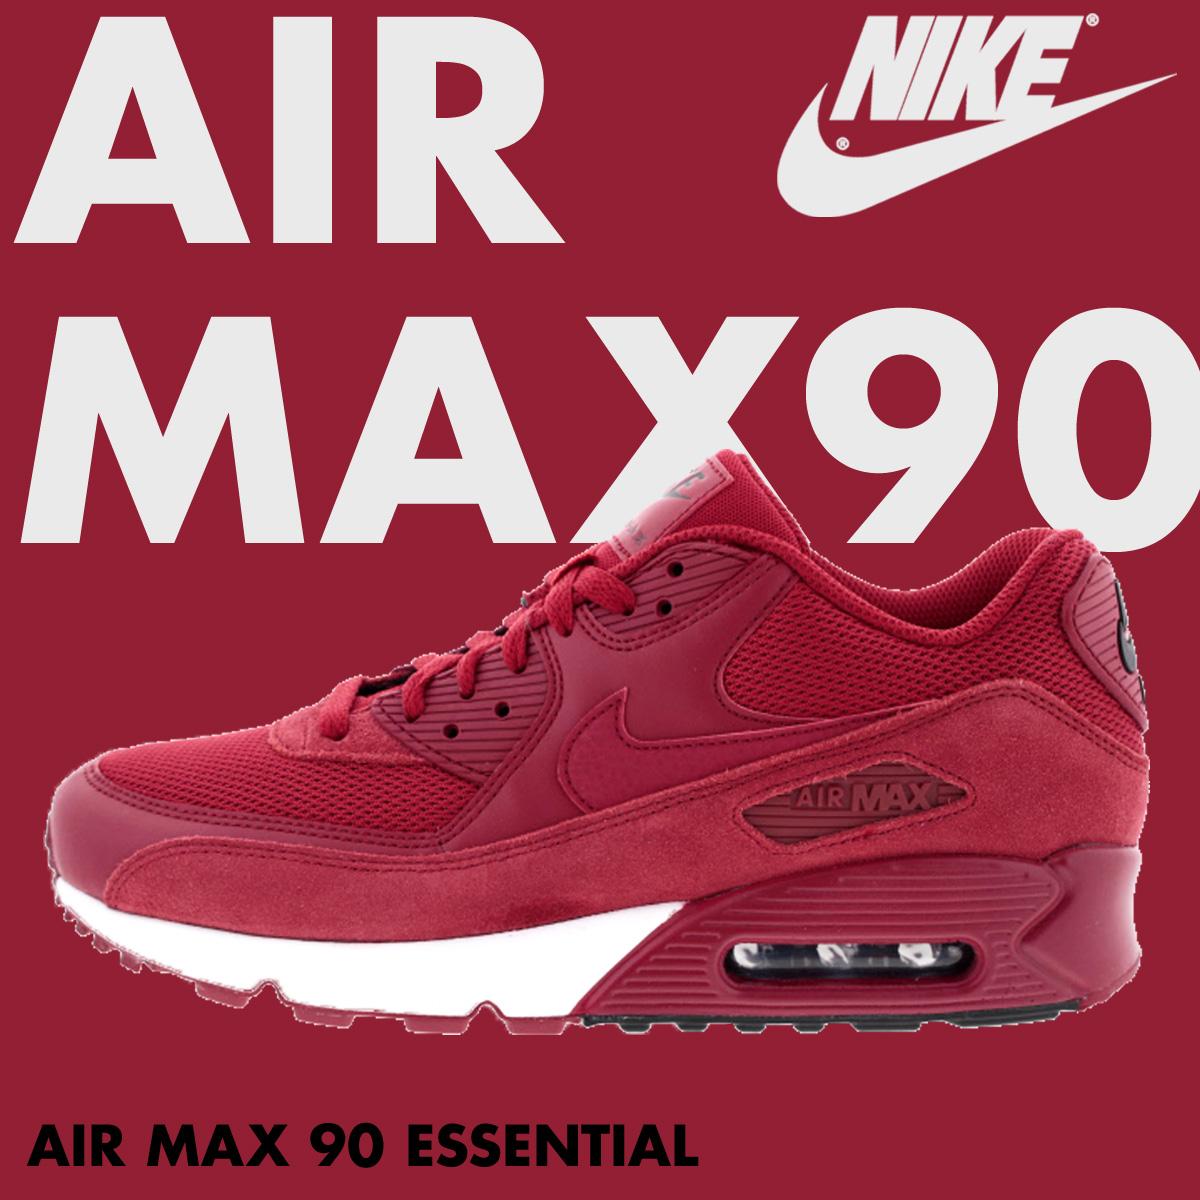 huge discount 5ef1f c3e74 Nike NIKE Air Max men sneakers AIR MAX 90 ESSENTIAL 537,384-604 shoes red   6 21 Shinnyu load